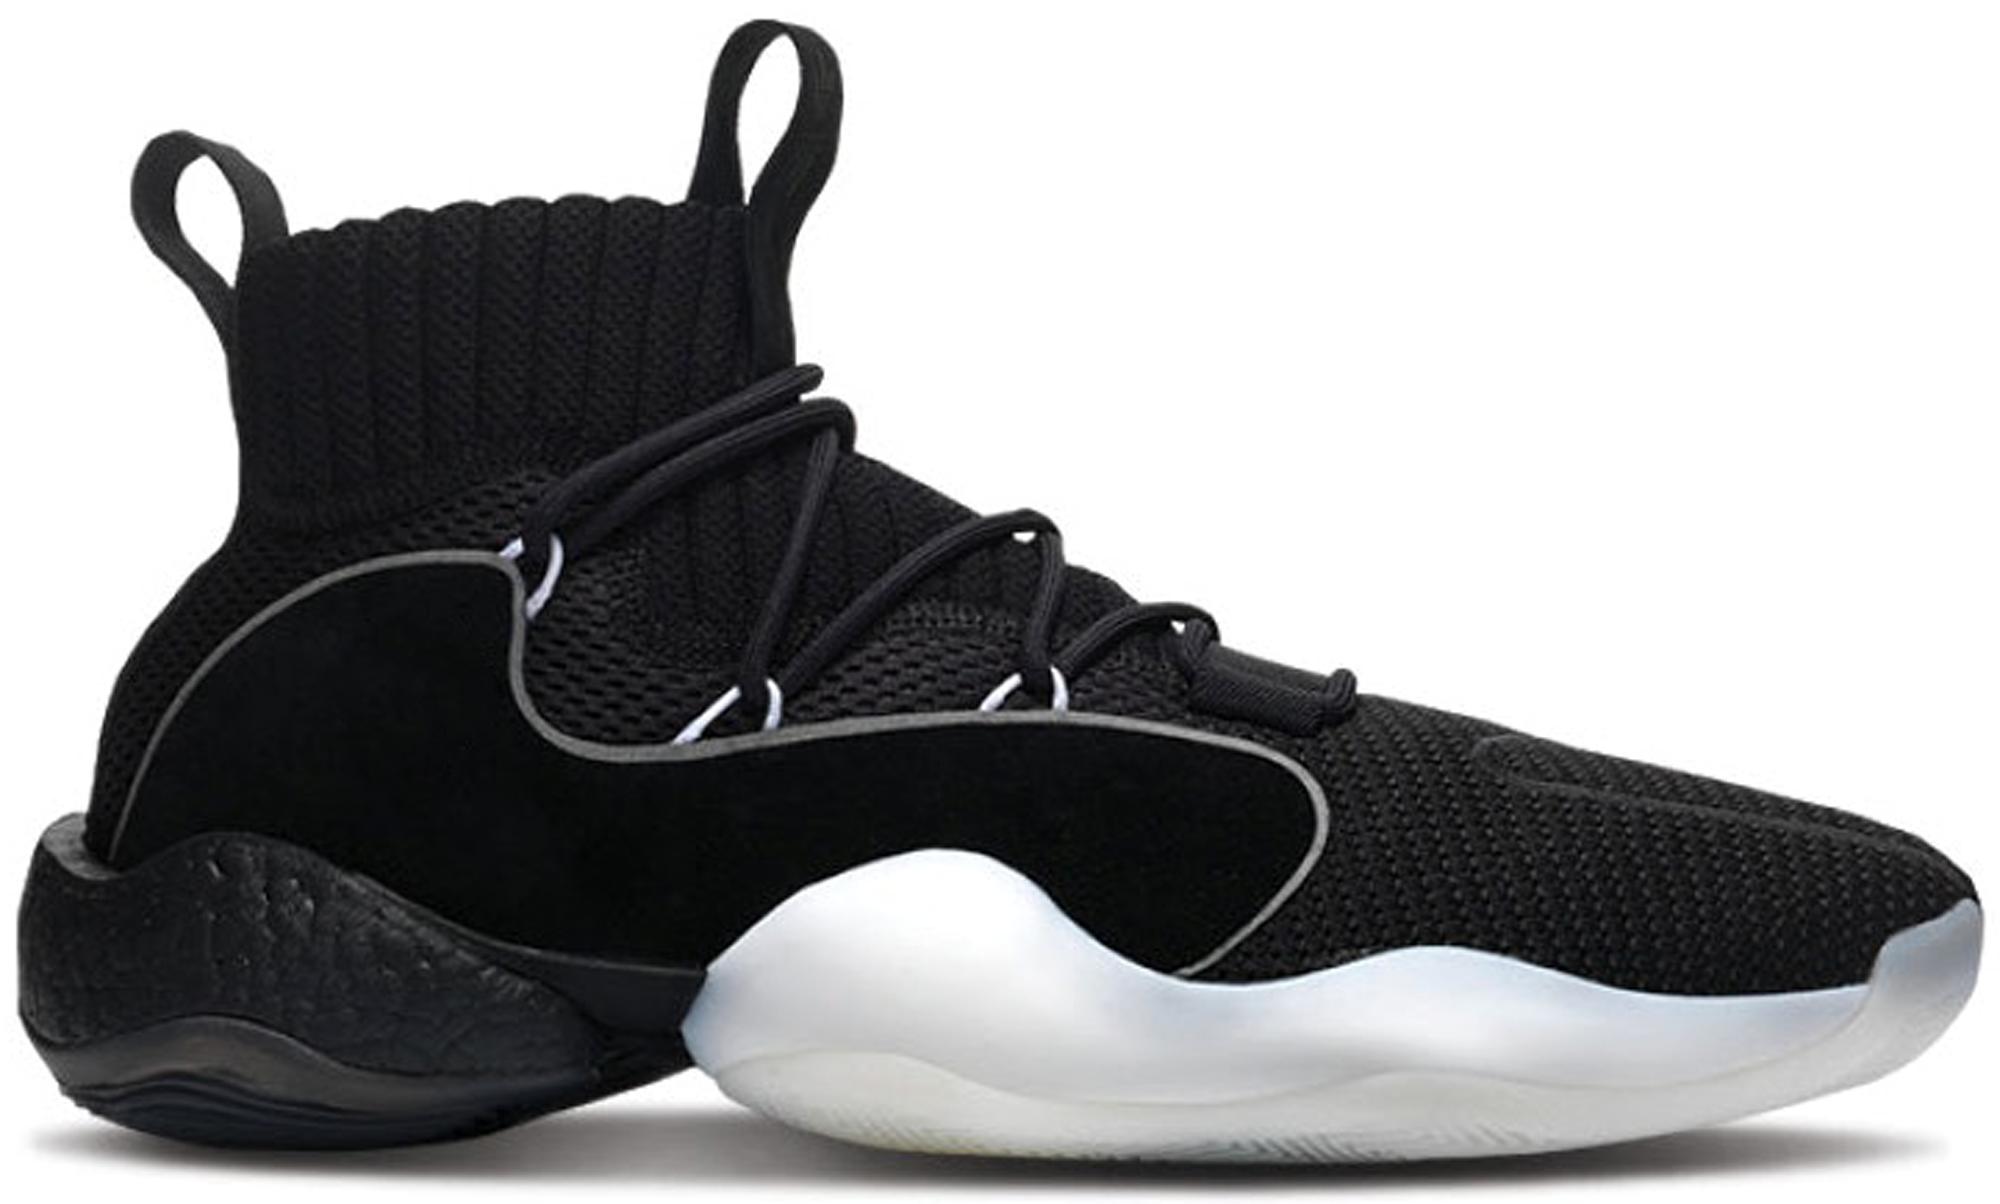 adidas Crazy BYW X Black White